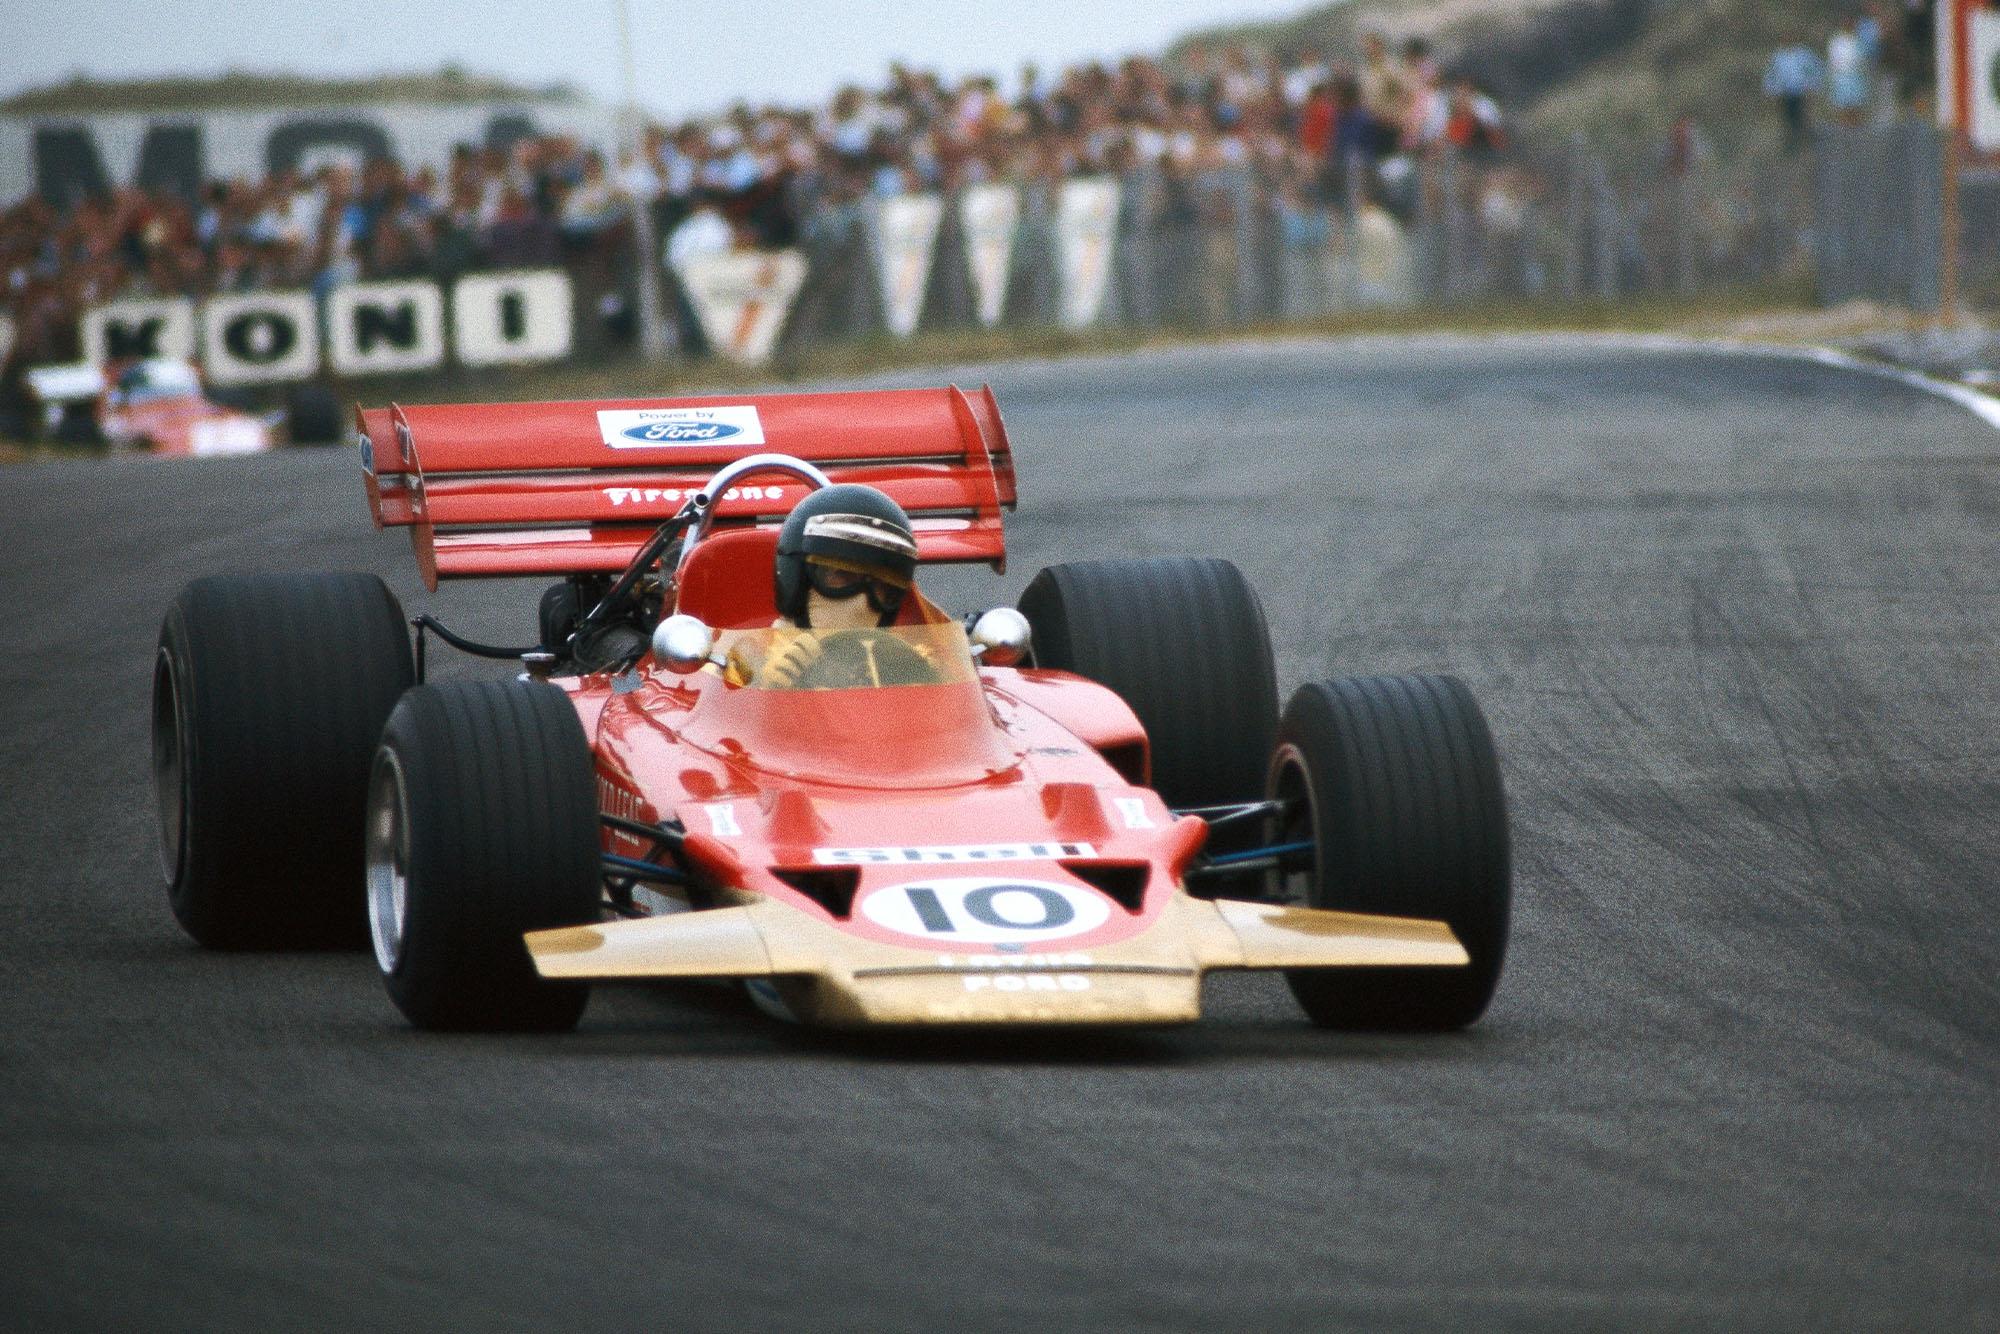 Jochen RIndt in his Lotus at the 1970 Dutch Grand Prix